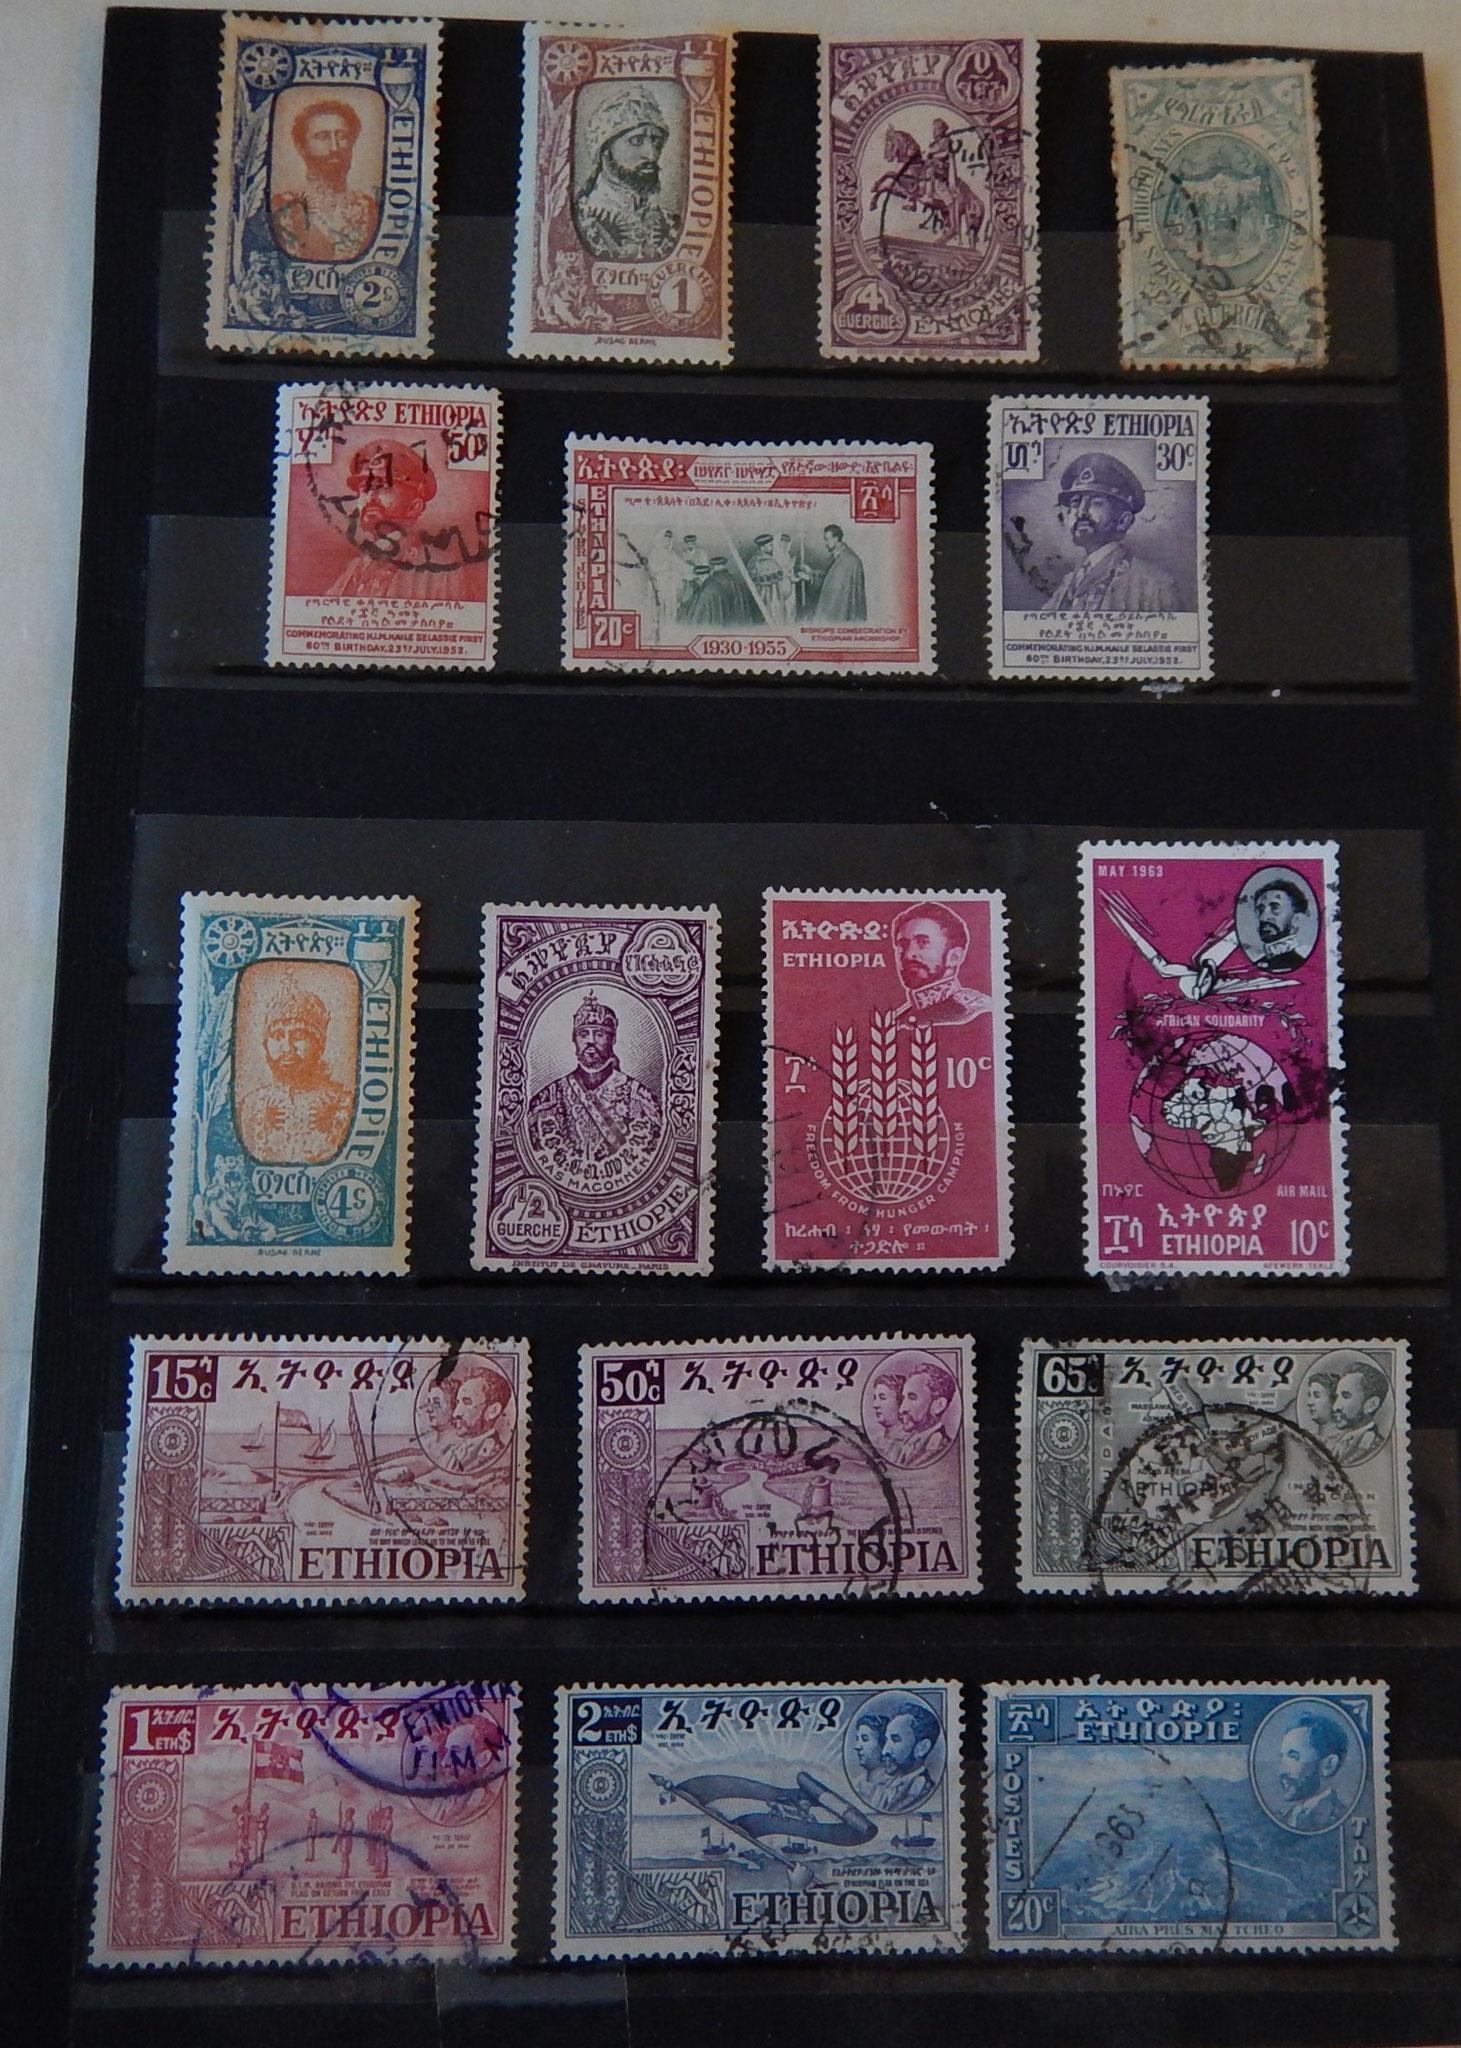 Grand choix de timbres ©Textes_et_Photos_Pascal_Mawuli_Macé_Voyage_Ethiopie_Commerce_solidaire_Timbre_Ethiopie_Ethiopian_Stamp_Travaux_Work_RasTafari_Addis_Abeba_Mawuli-Ethiopie_artisanat_ethiopien